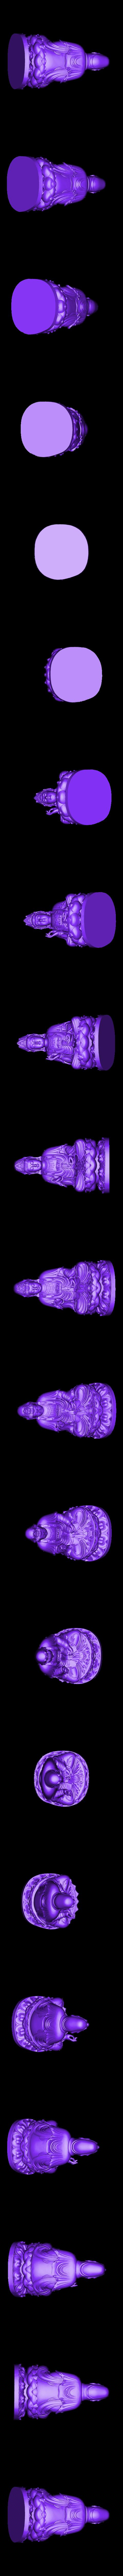 010guanyin.stl Download free OBJ file Guanyin bodhisattva Kwan-yin sculpture for cnc or 3d printer • 3D printable design, stlfilesfree